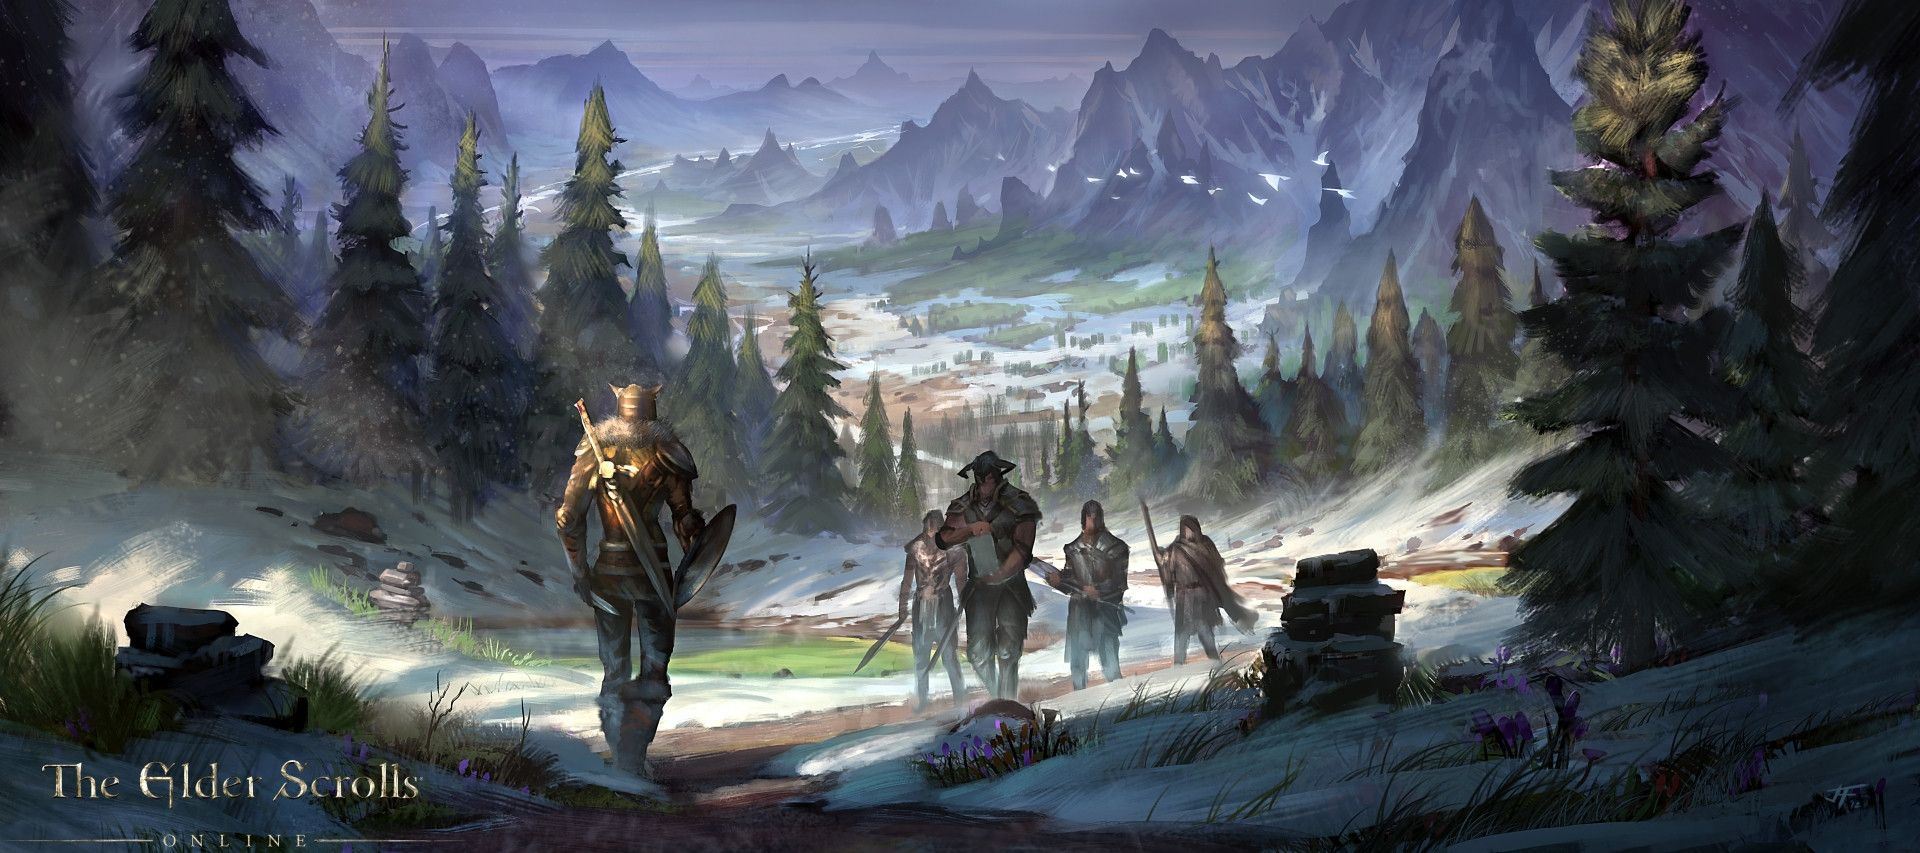 Video Game The Elder Scrolls Wallpaper Skyrim Concept Art Elder Scrolls Online Elder Scrolls Art